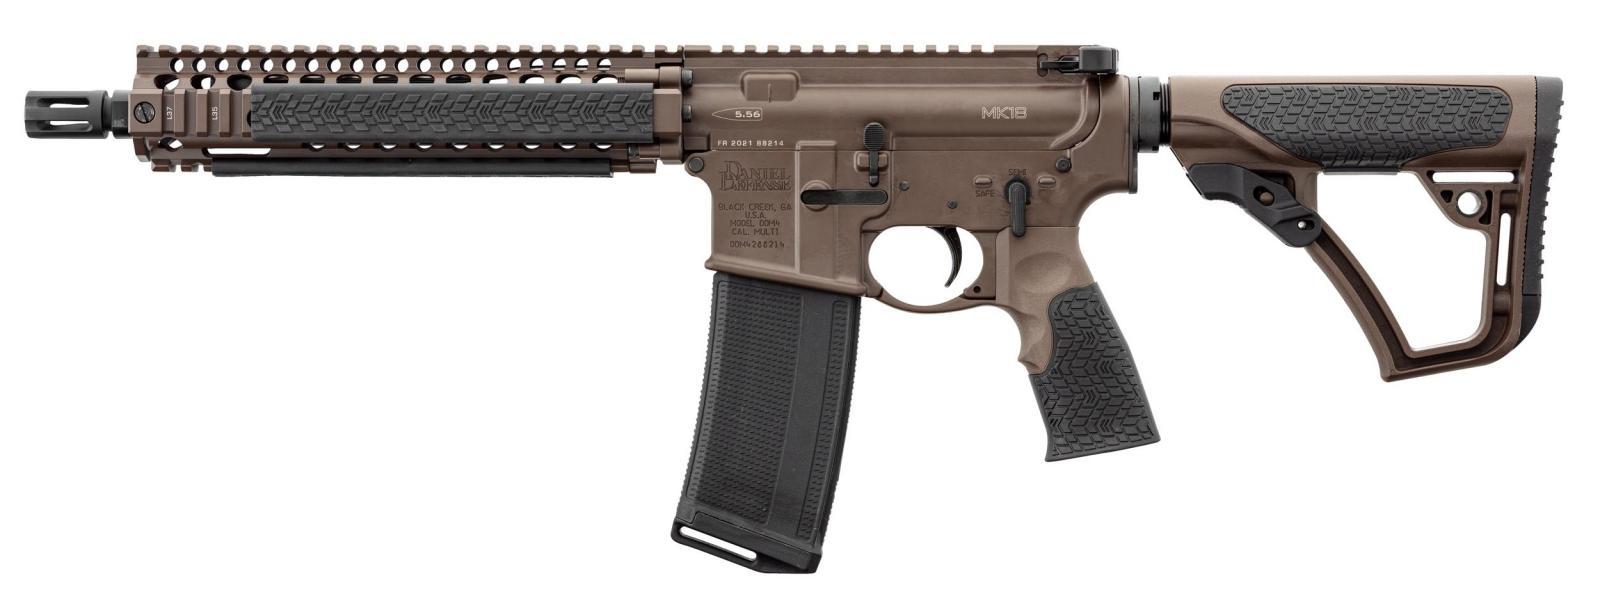 "Carabine DANIEL DEFENSE MK-18 Canon 10.3"" Cal. 223"